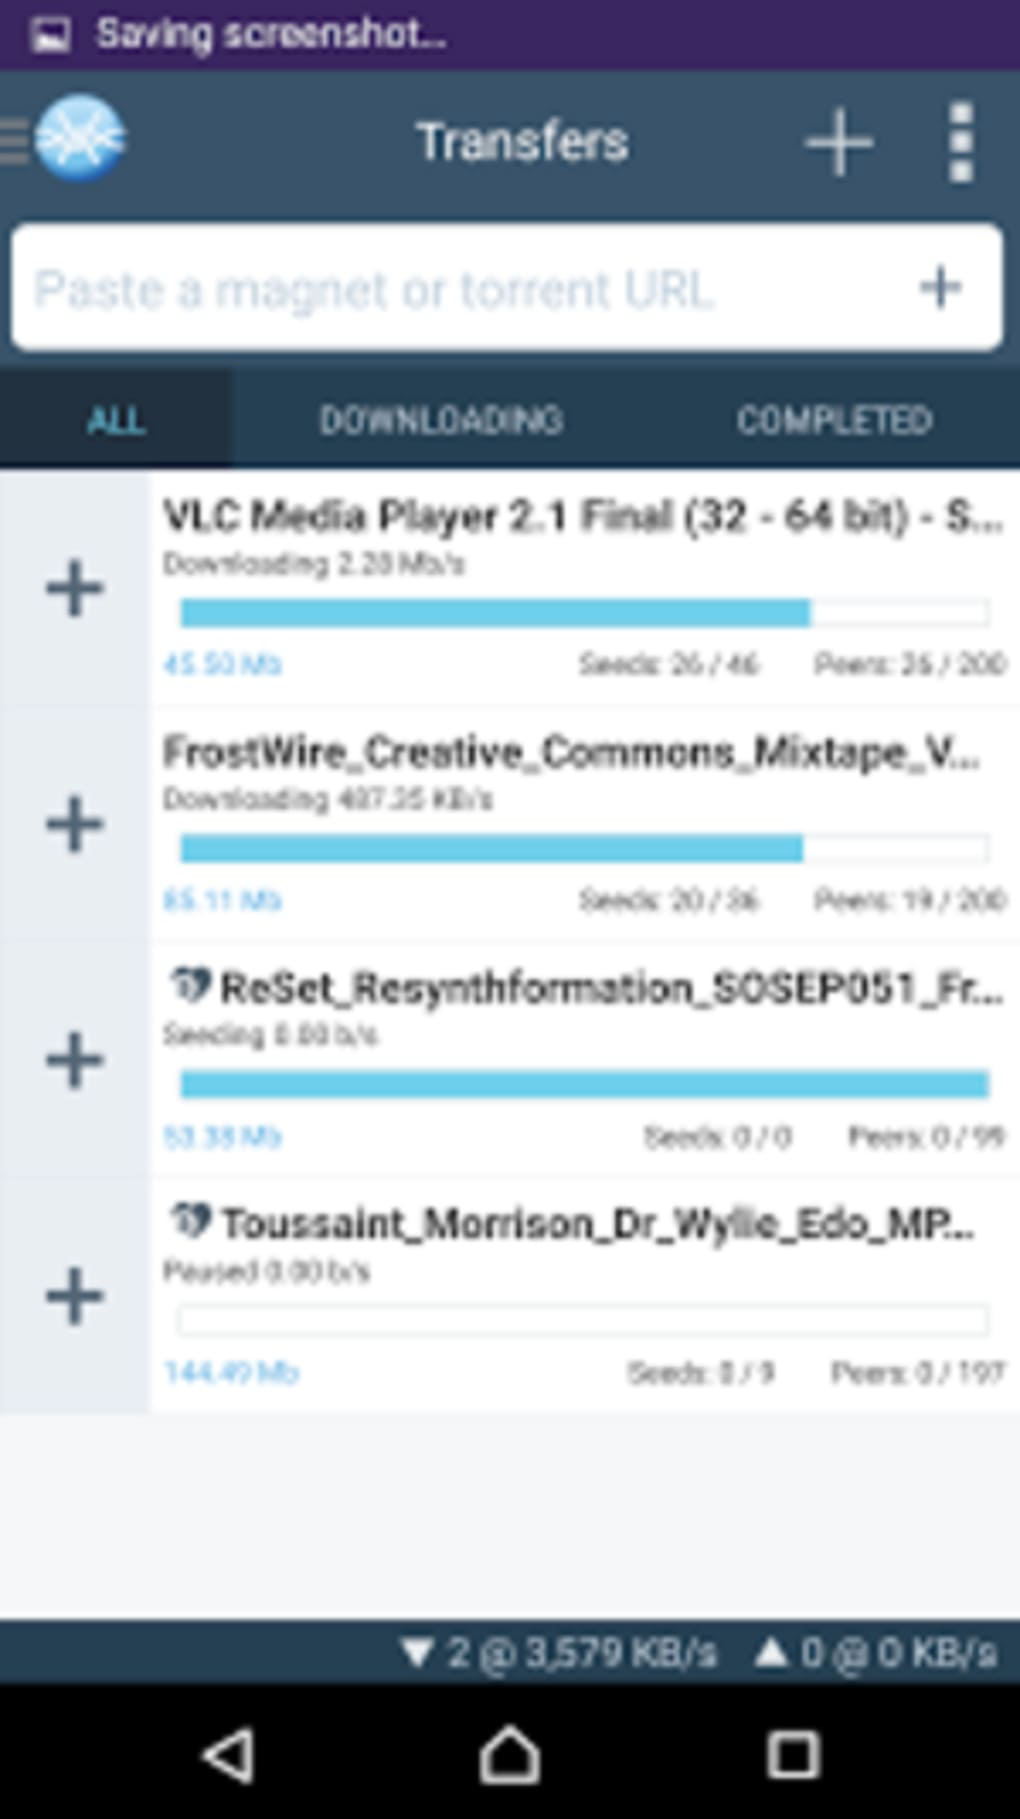 telecharger application pour telephone android gratuit